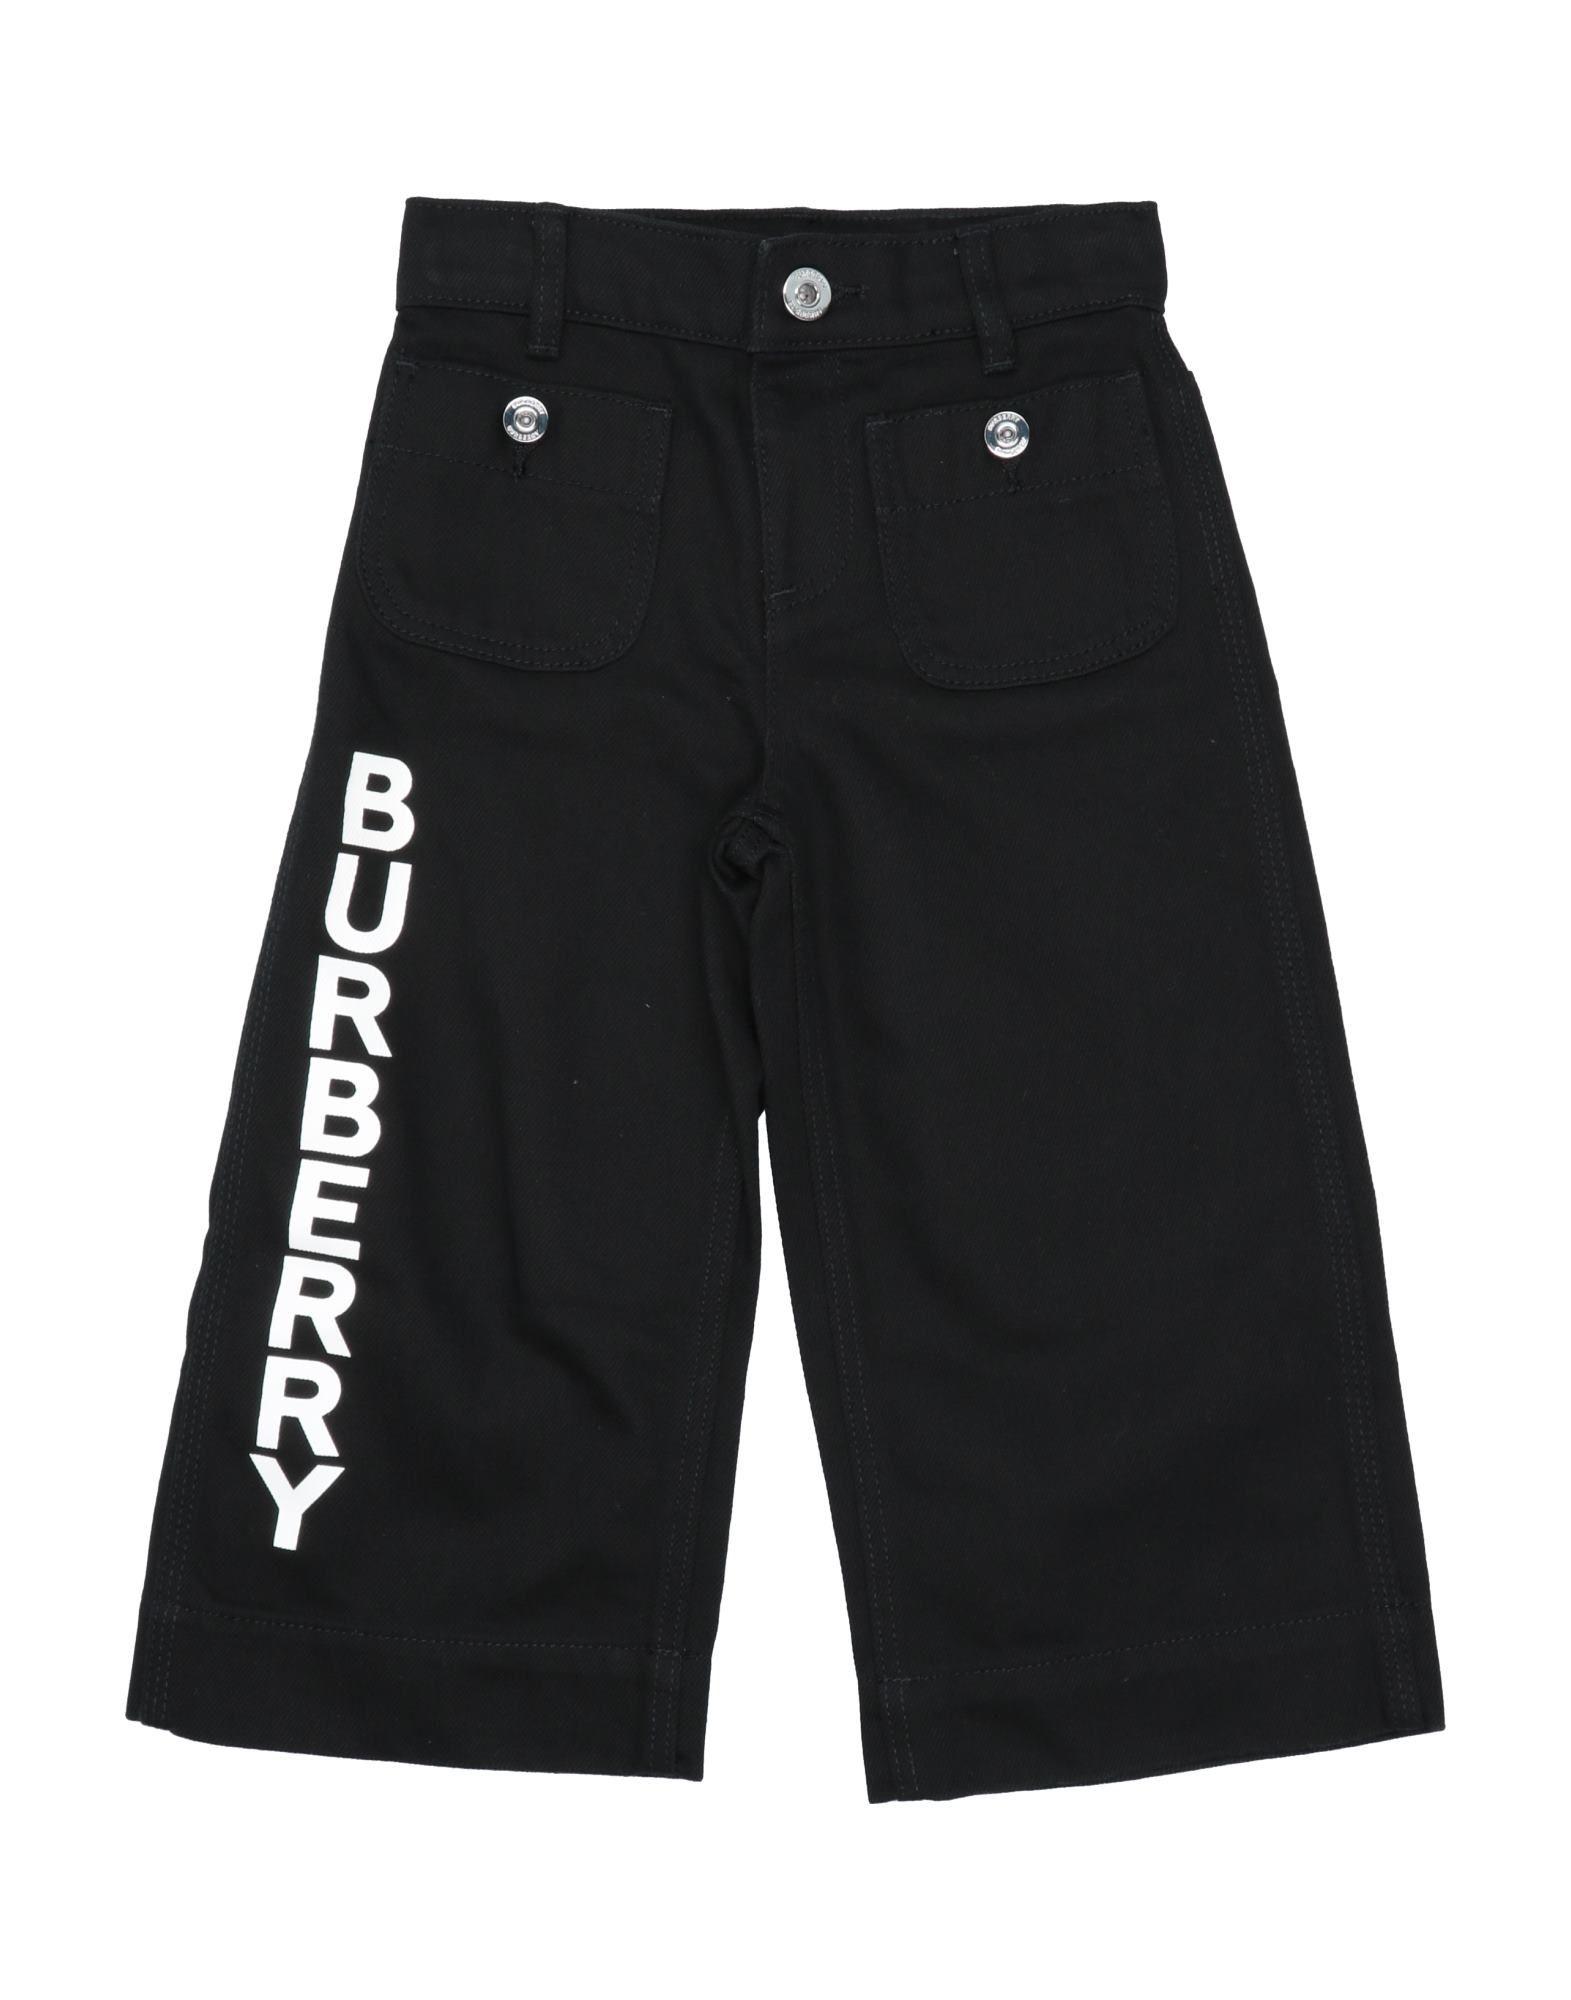 Burberry Kids' Casual Pants In Black